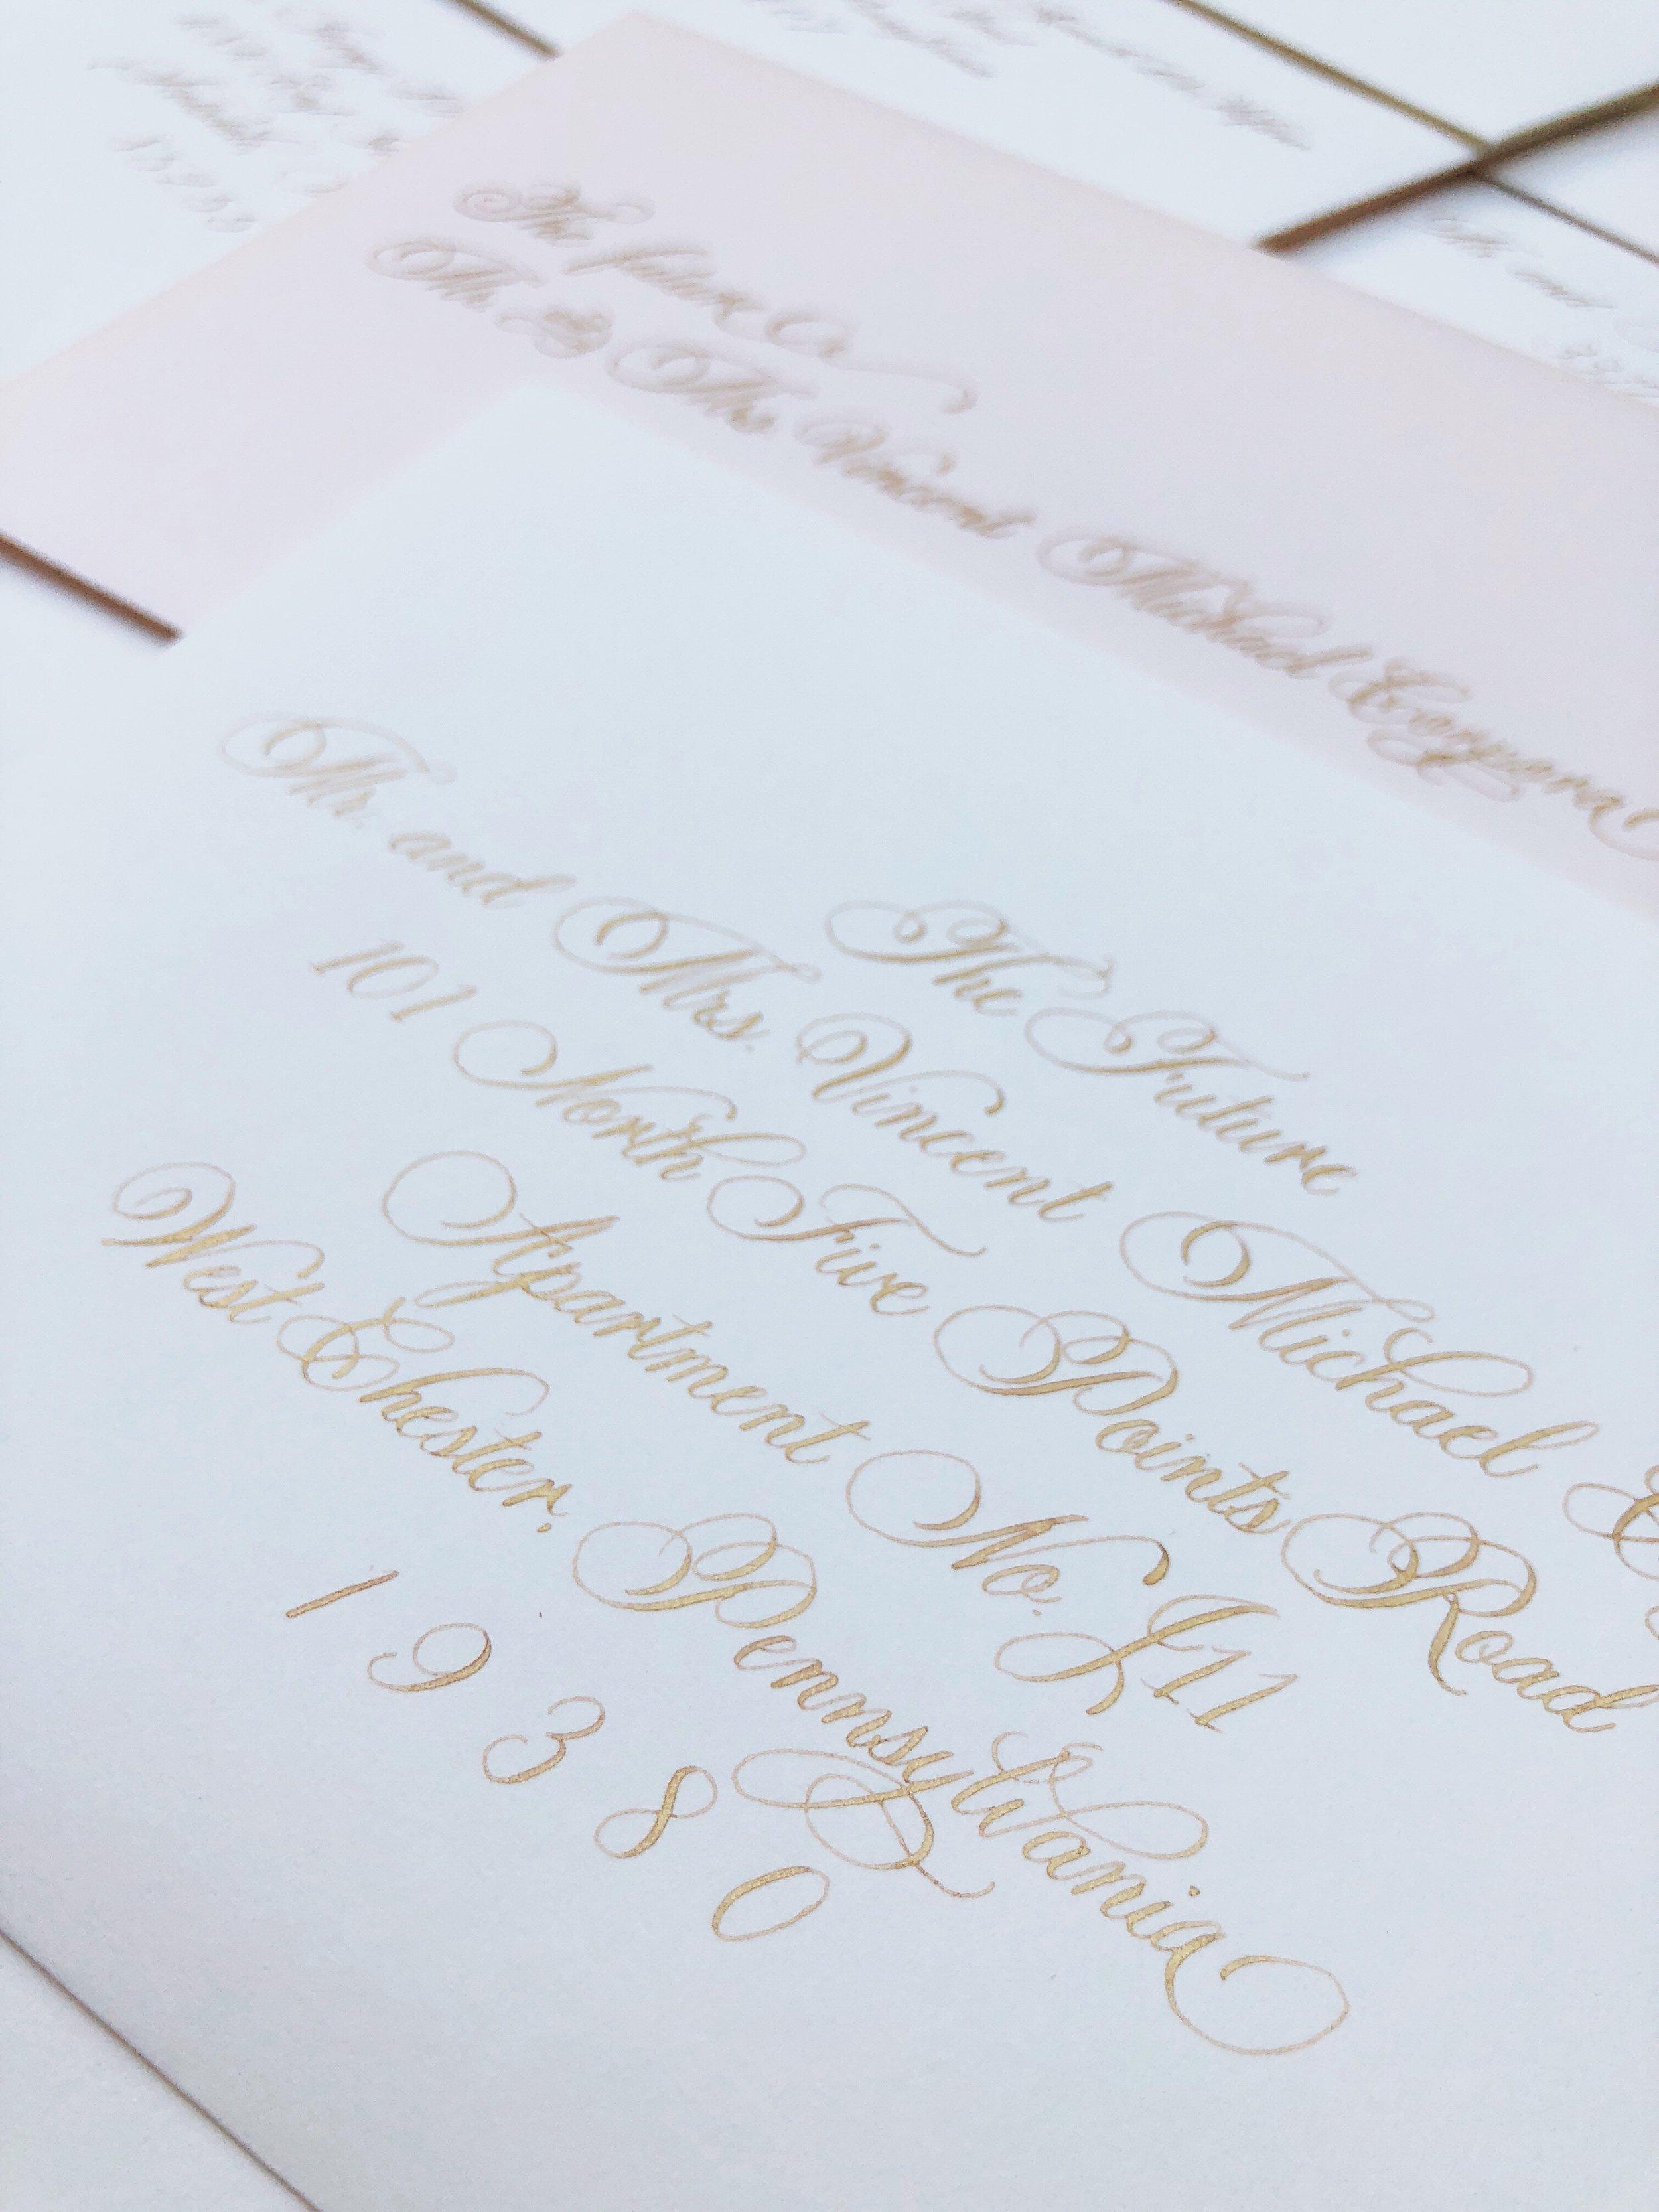 Central PA, York PA, JesSmith Designs, custom, wedding, invitations, bridal, Harrisburg, hanover, calligraphy, baltimore, wedding invitations, lancaster, gettysburg, 07-04 11.19.45.jpg